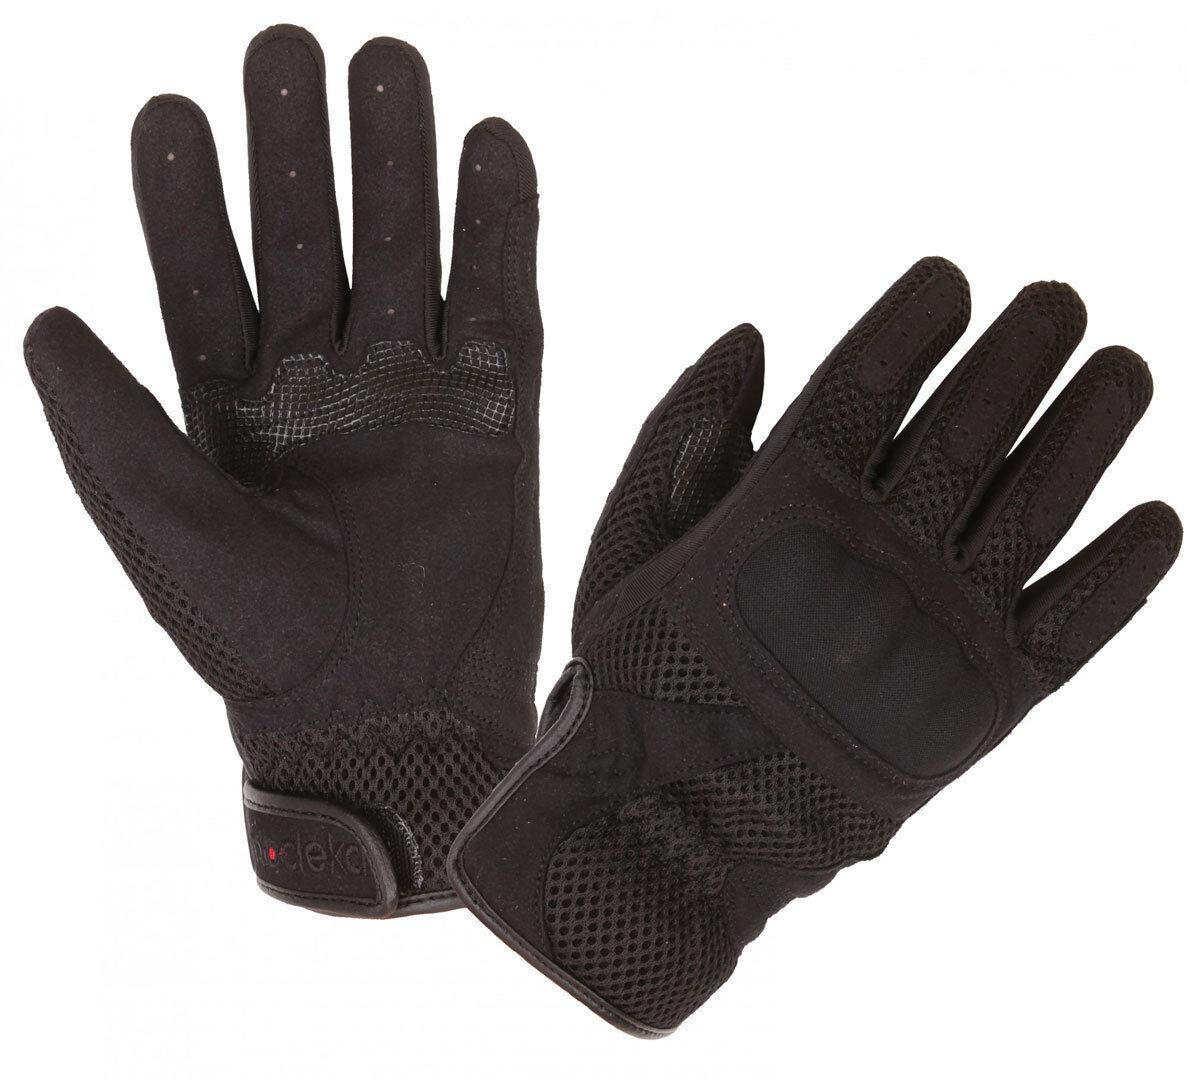 Modeka Mesh Motorcycle Gloves  - Size: Large